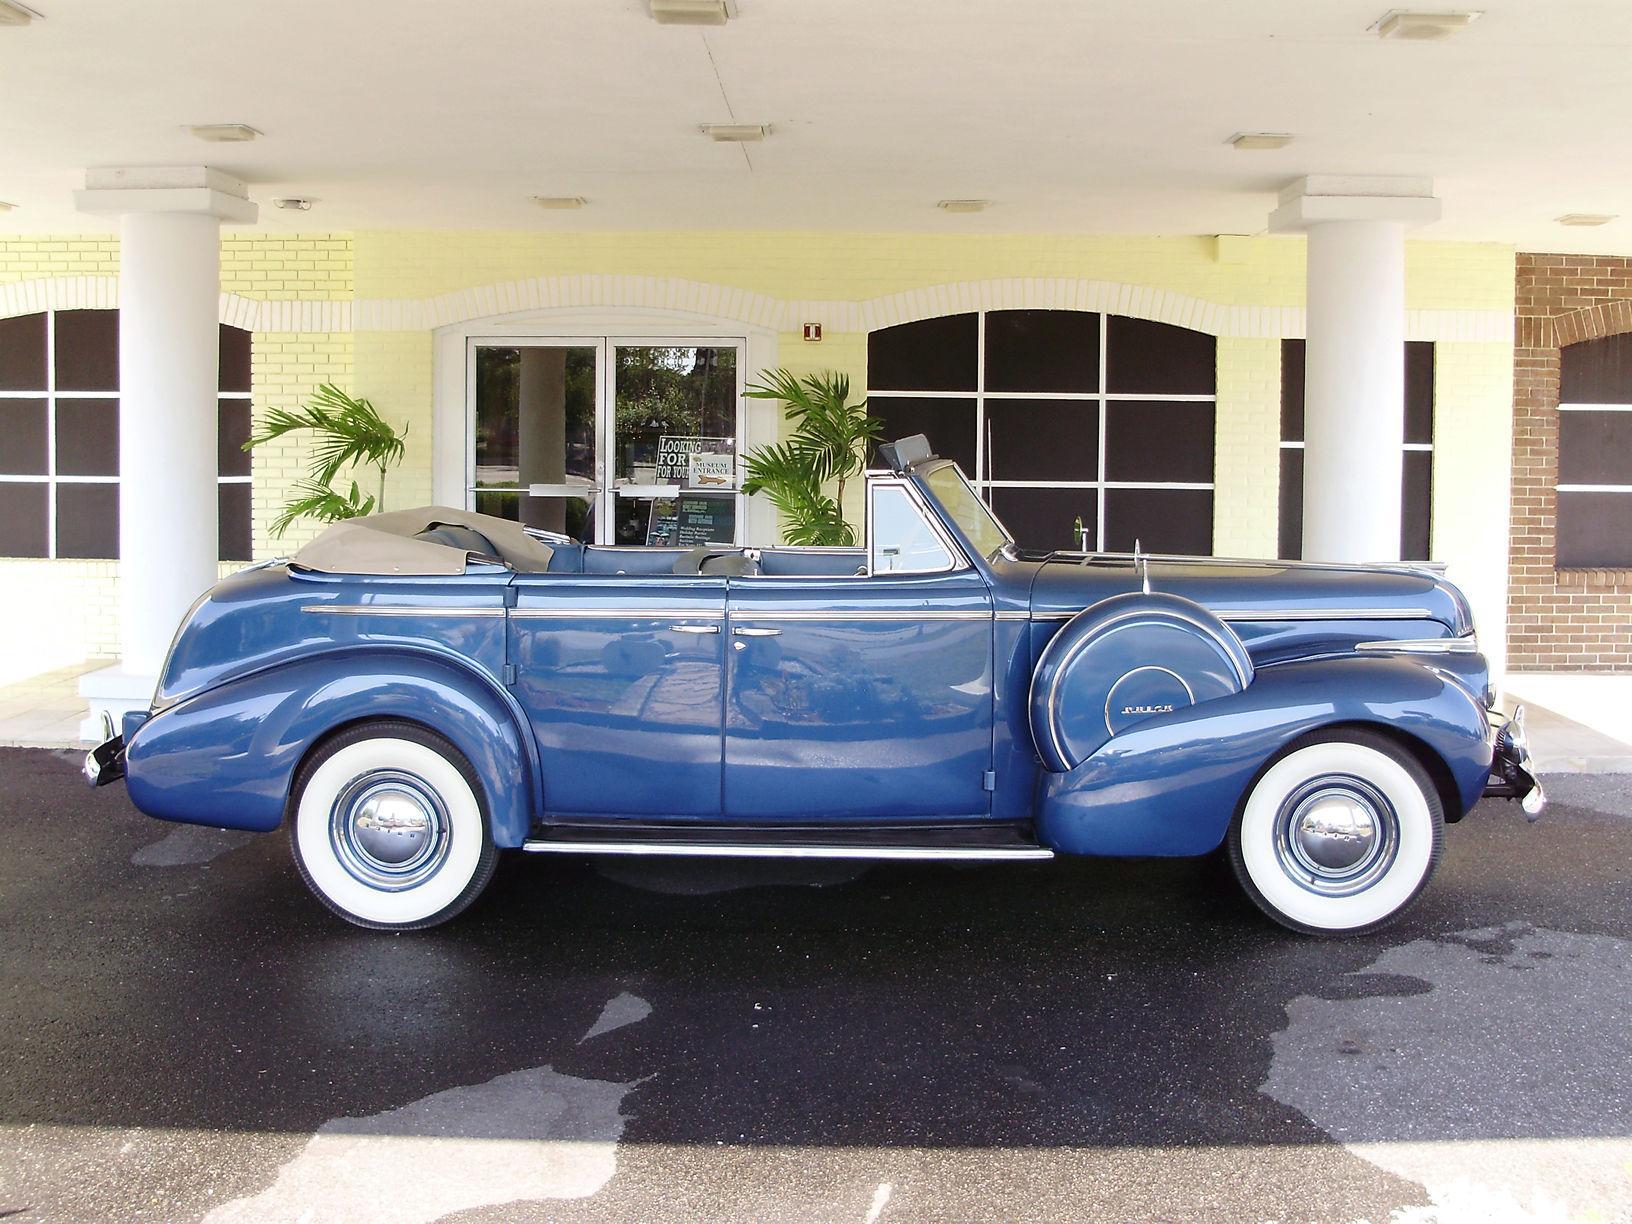 1940 BUICK CENTURY CONVERTIBLE SEDAN - Vintage Motors of Sarasota Inc. #7